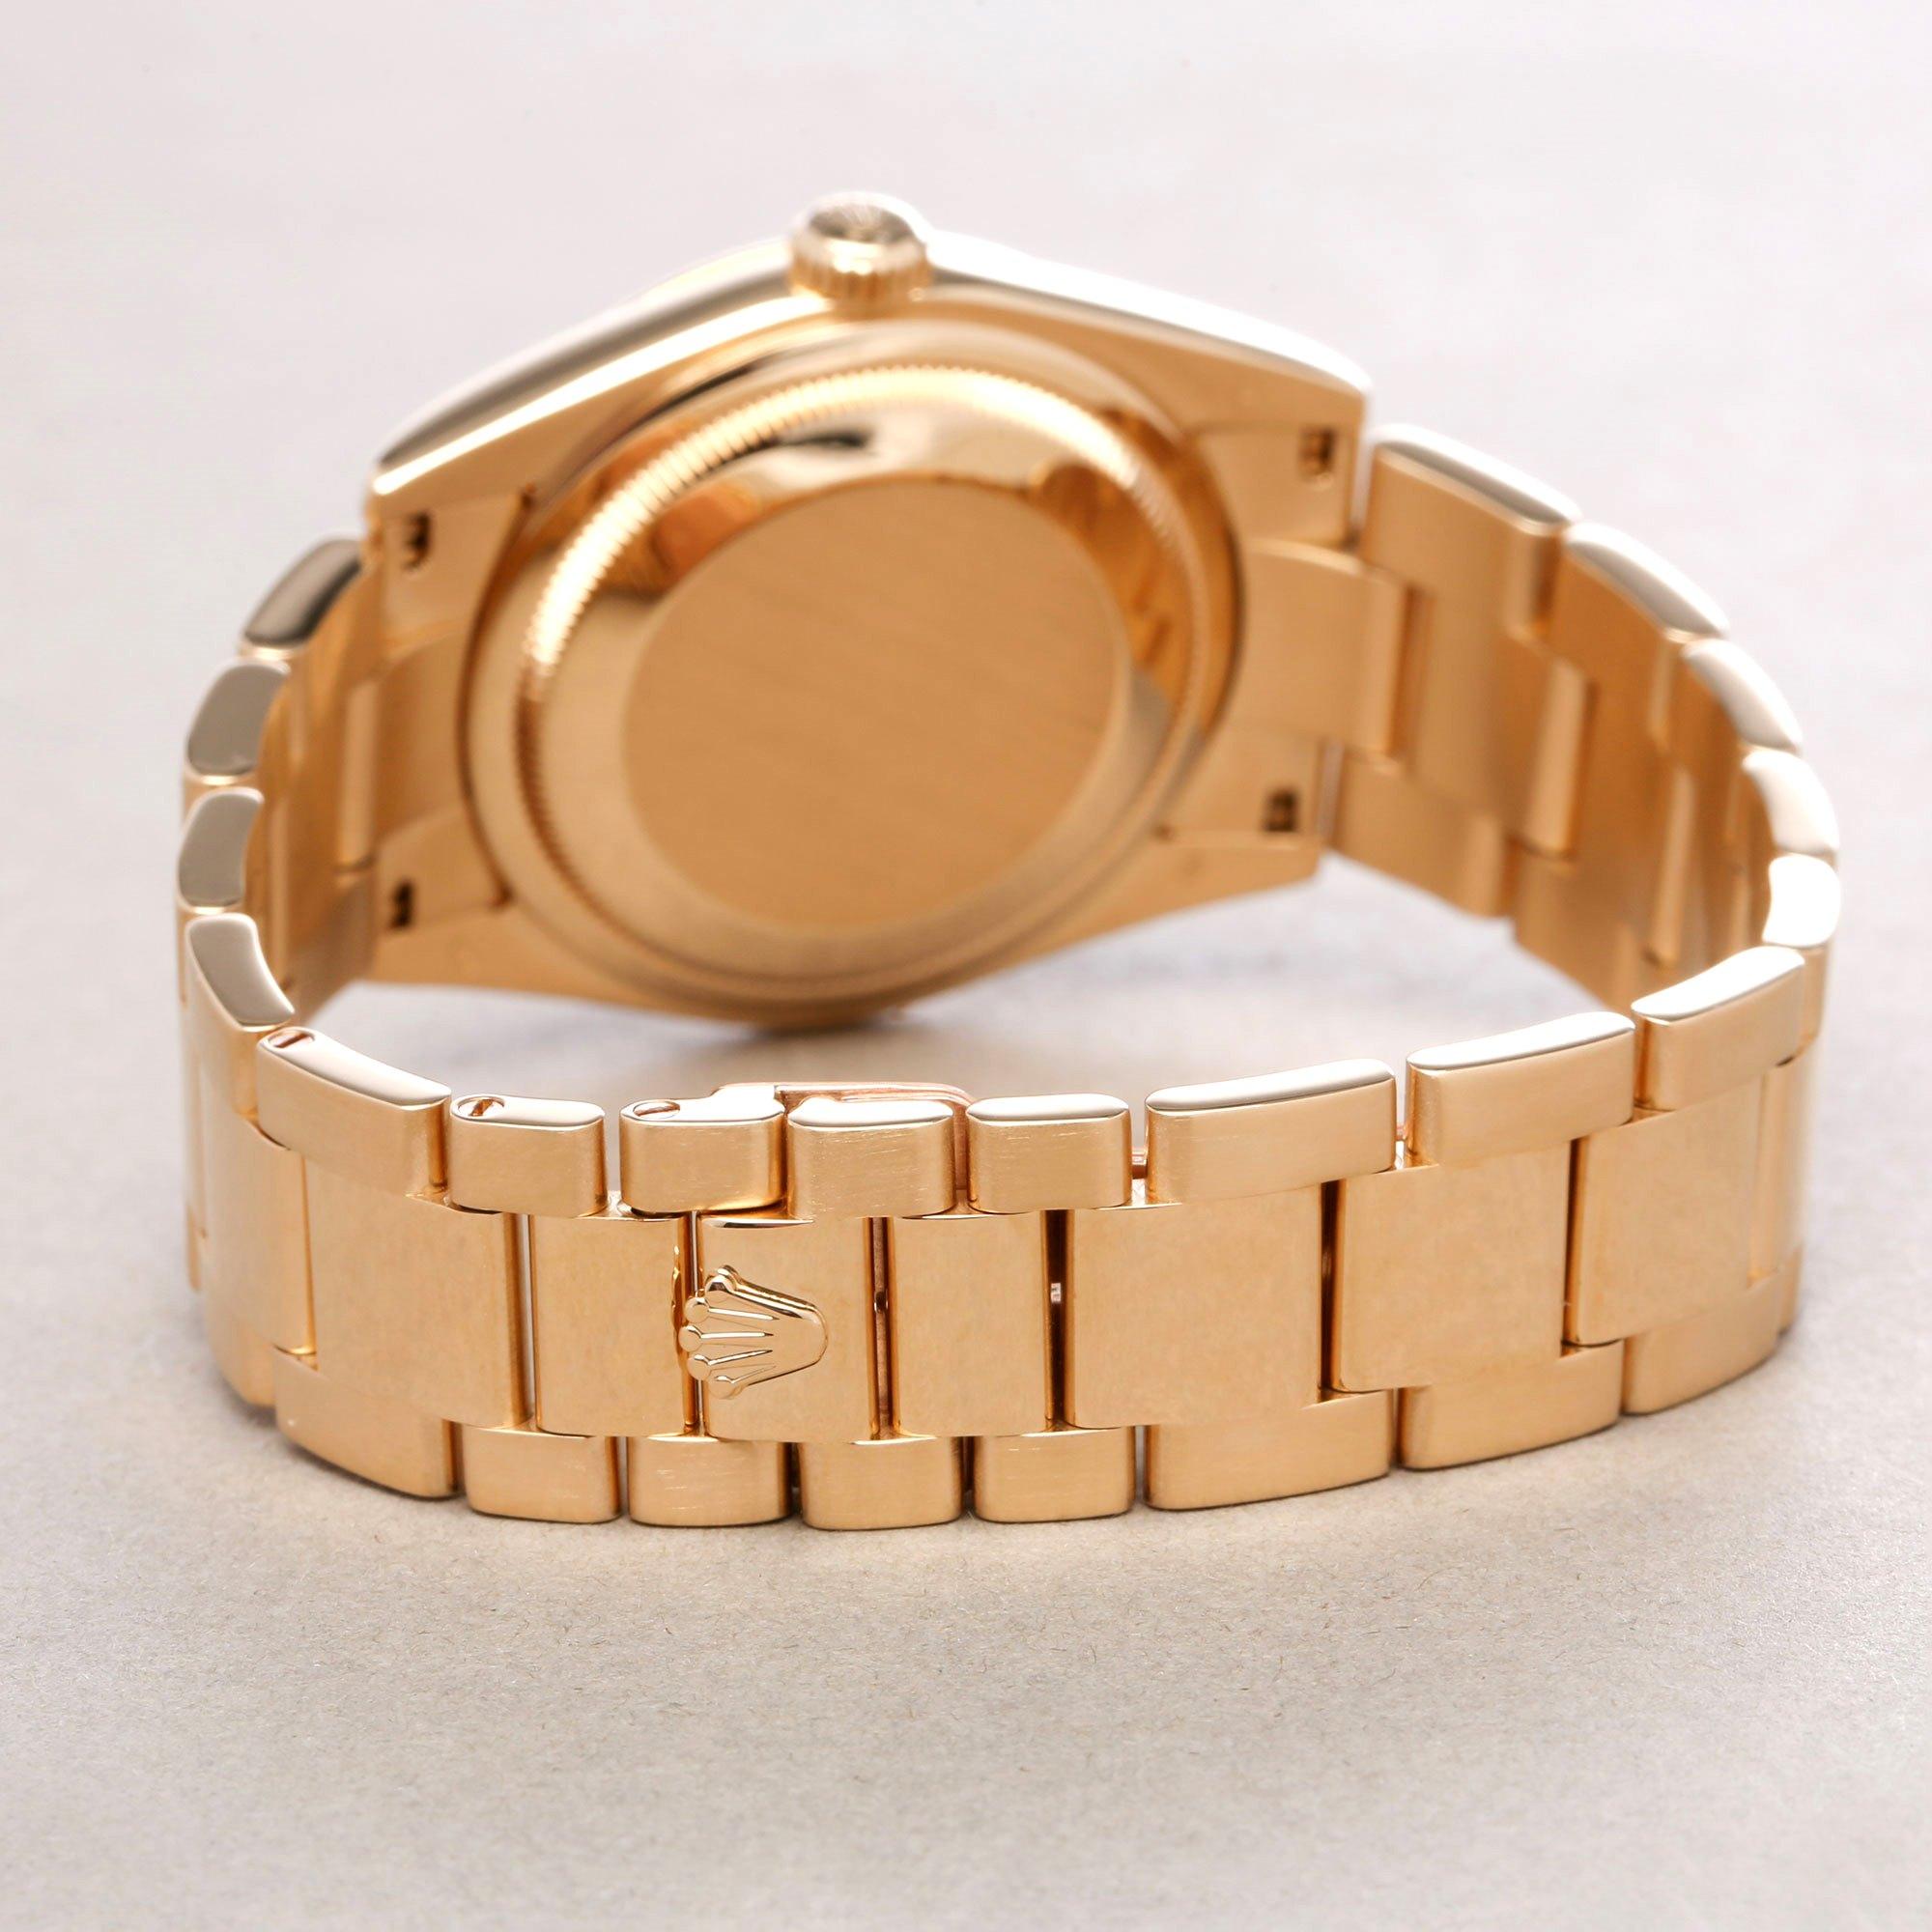 Rolex Day-Date 36 Rubellite Diamond 18K Yellow Gold - 118238 Yellow Gold 118238